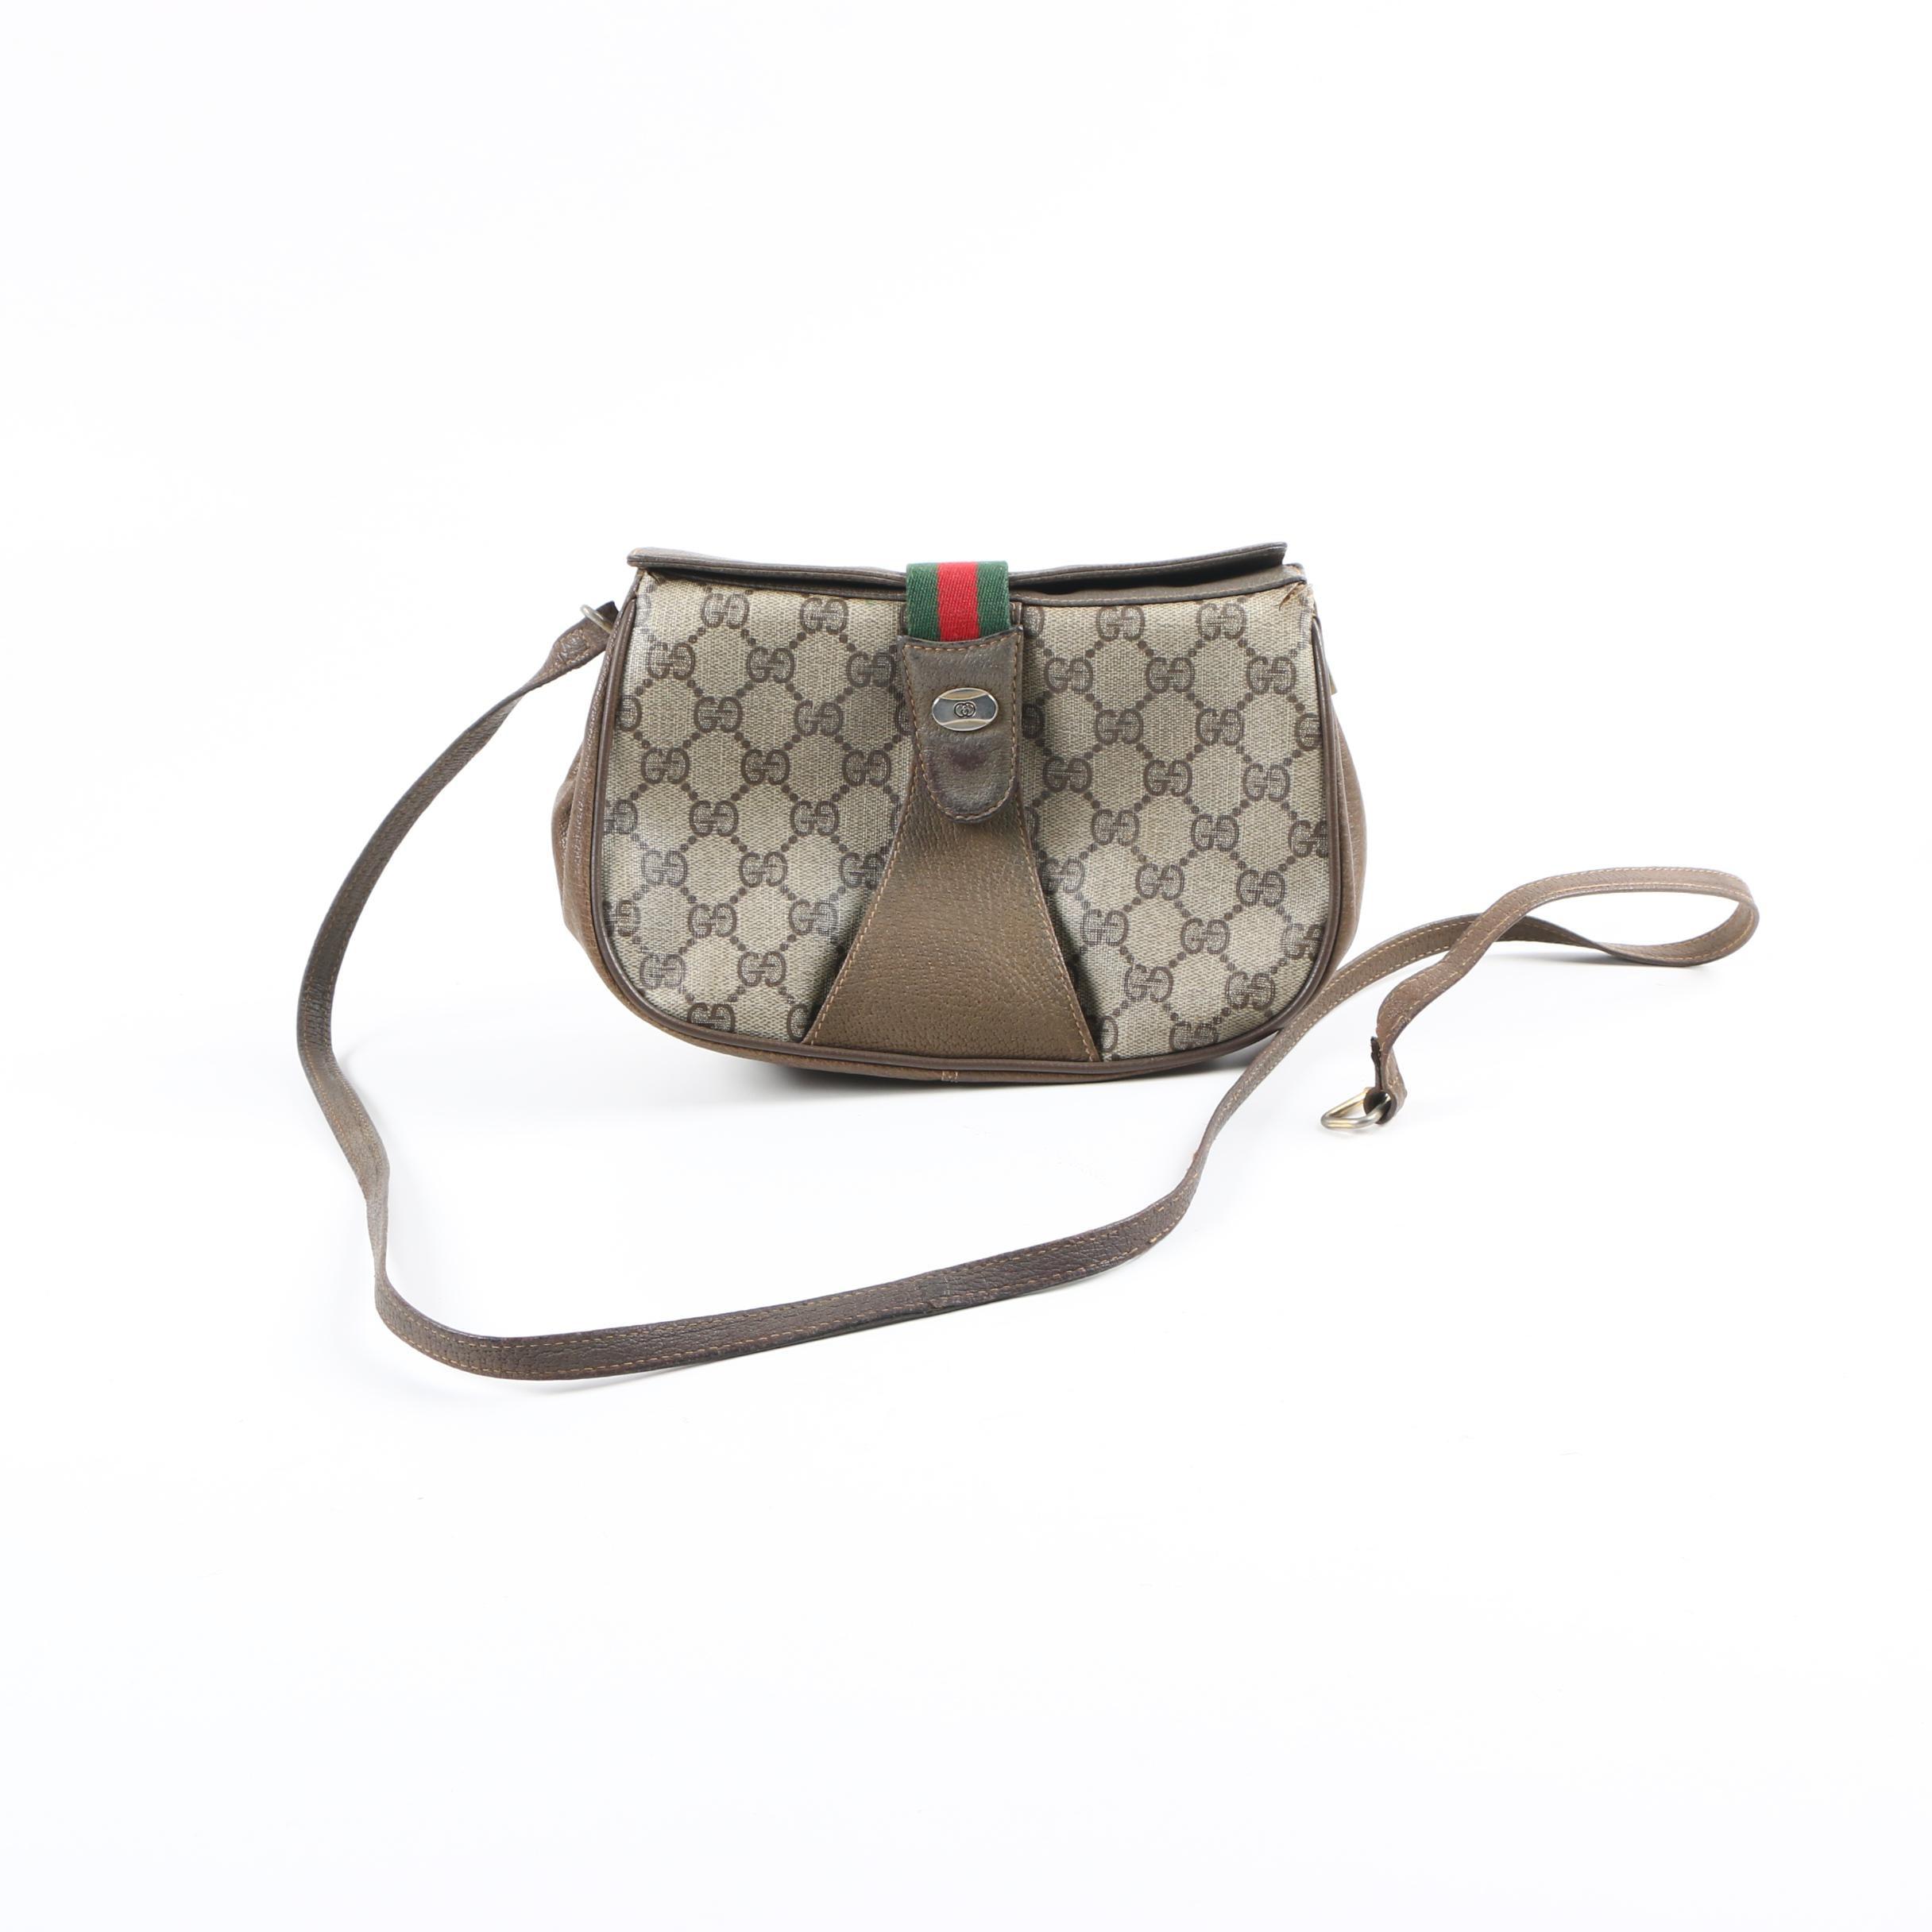 Vintage Gucci GG Supreme Canvas Monogram Web Detail Crossbody